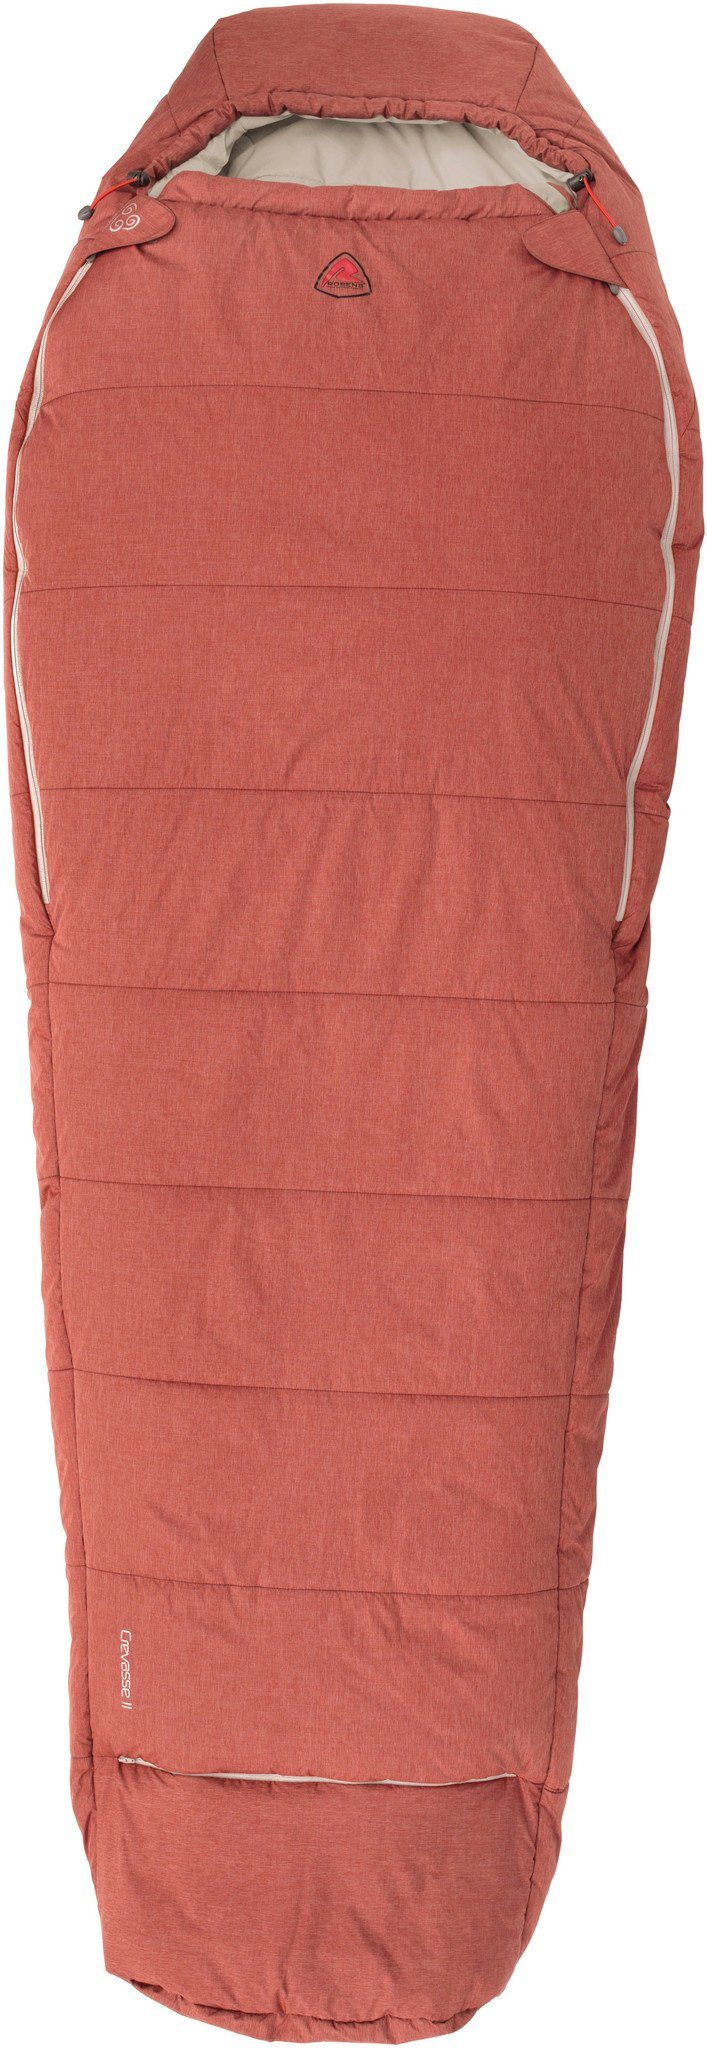 Robens Schlafsack »Crevasse I Sleeping Bag«